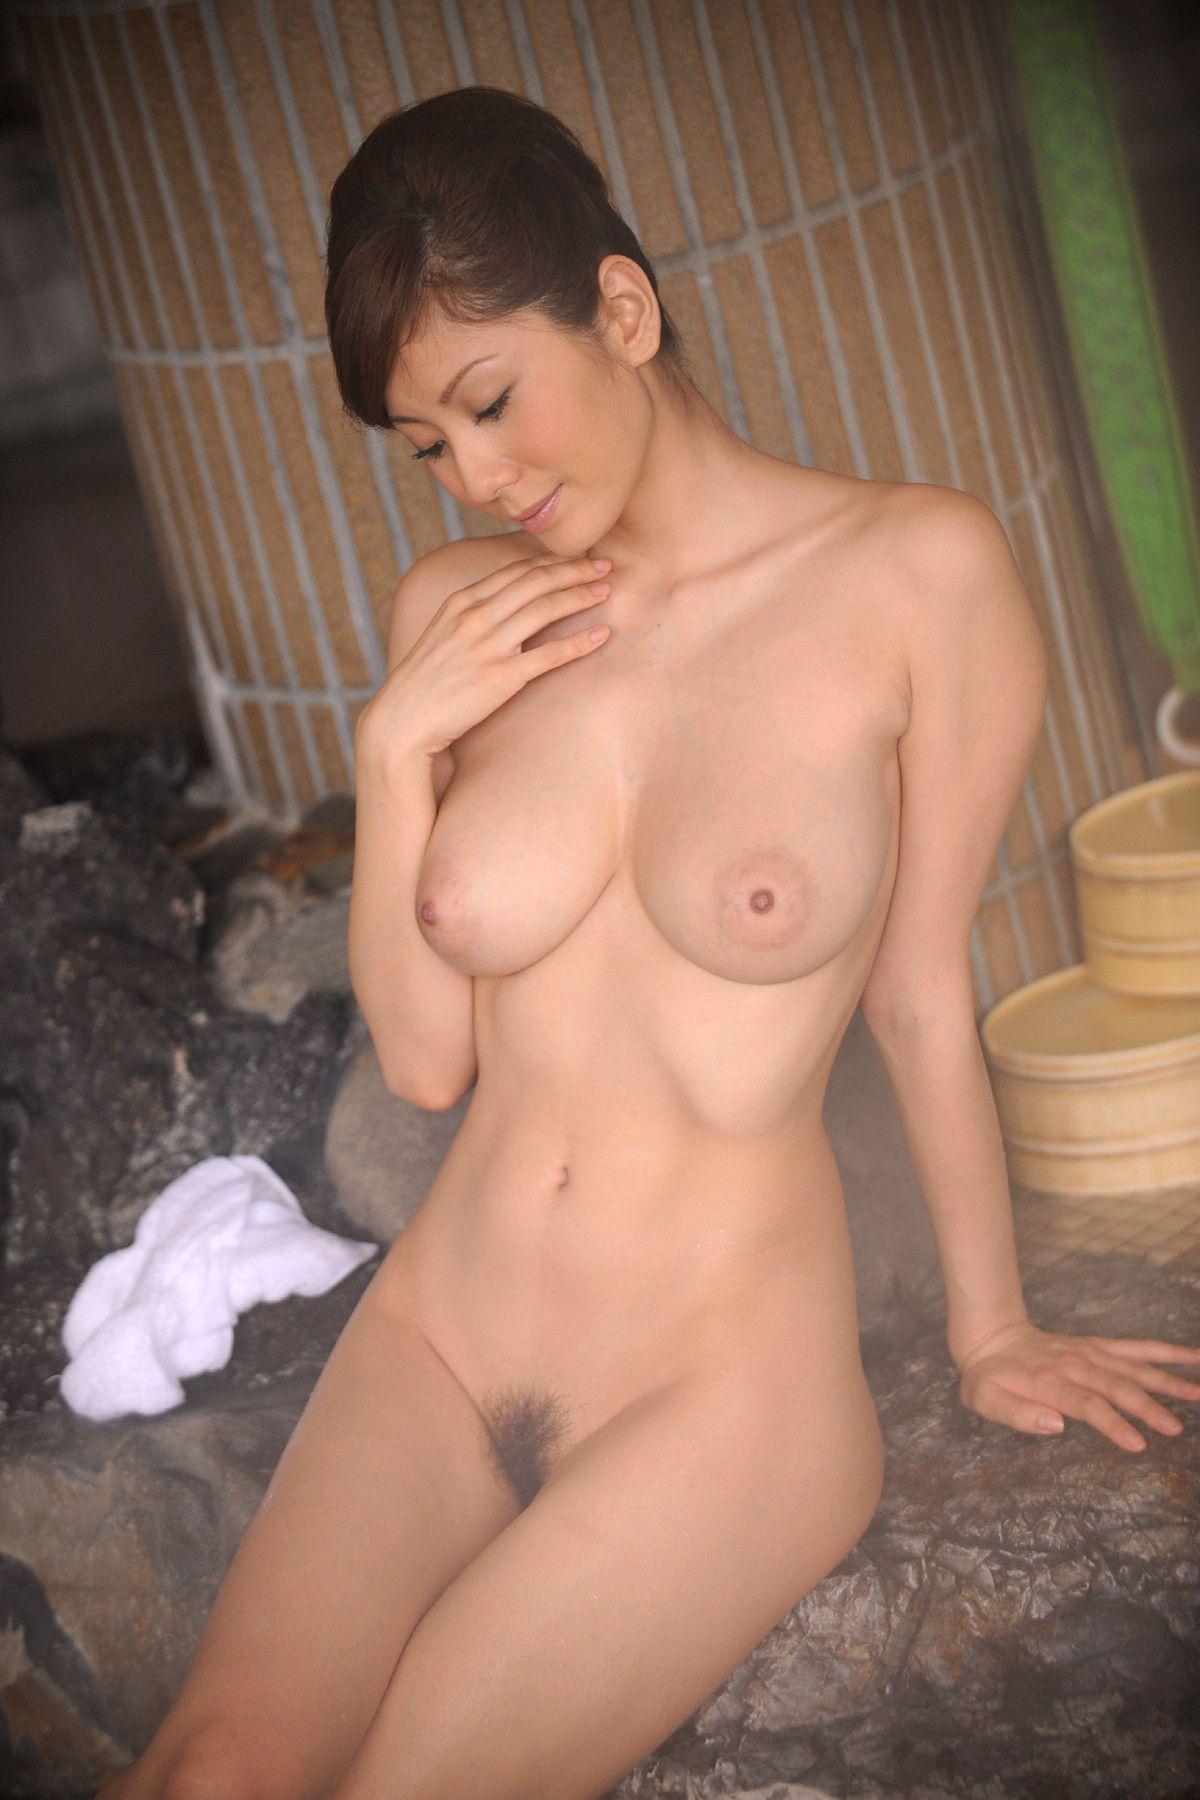 naked favdolls[[[[[[[[[「「 ]]] 日本人女性のヌードfavdolls porn lsm21 pimpandhost imagesize:1440x956(@@) naked  favdolls[[[[「「[[[$rajce.idnes.2010 pureloli.site3d[$ Pixsense pimpandhost(  ...